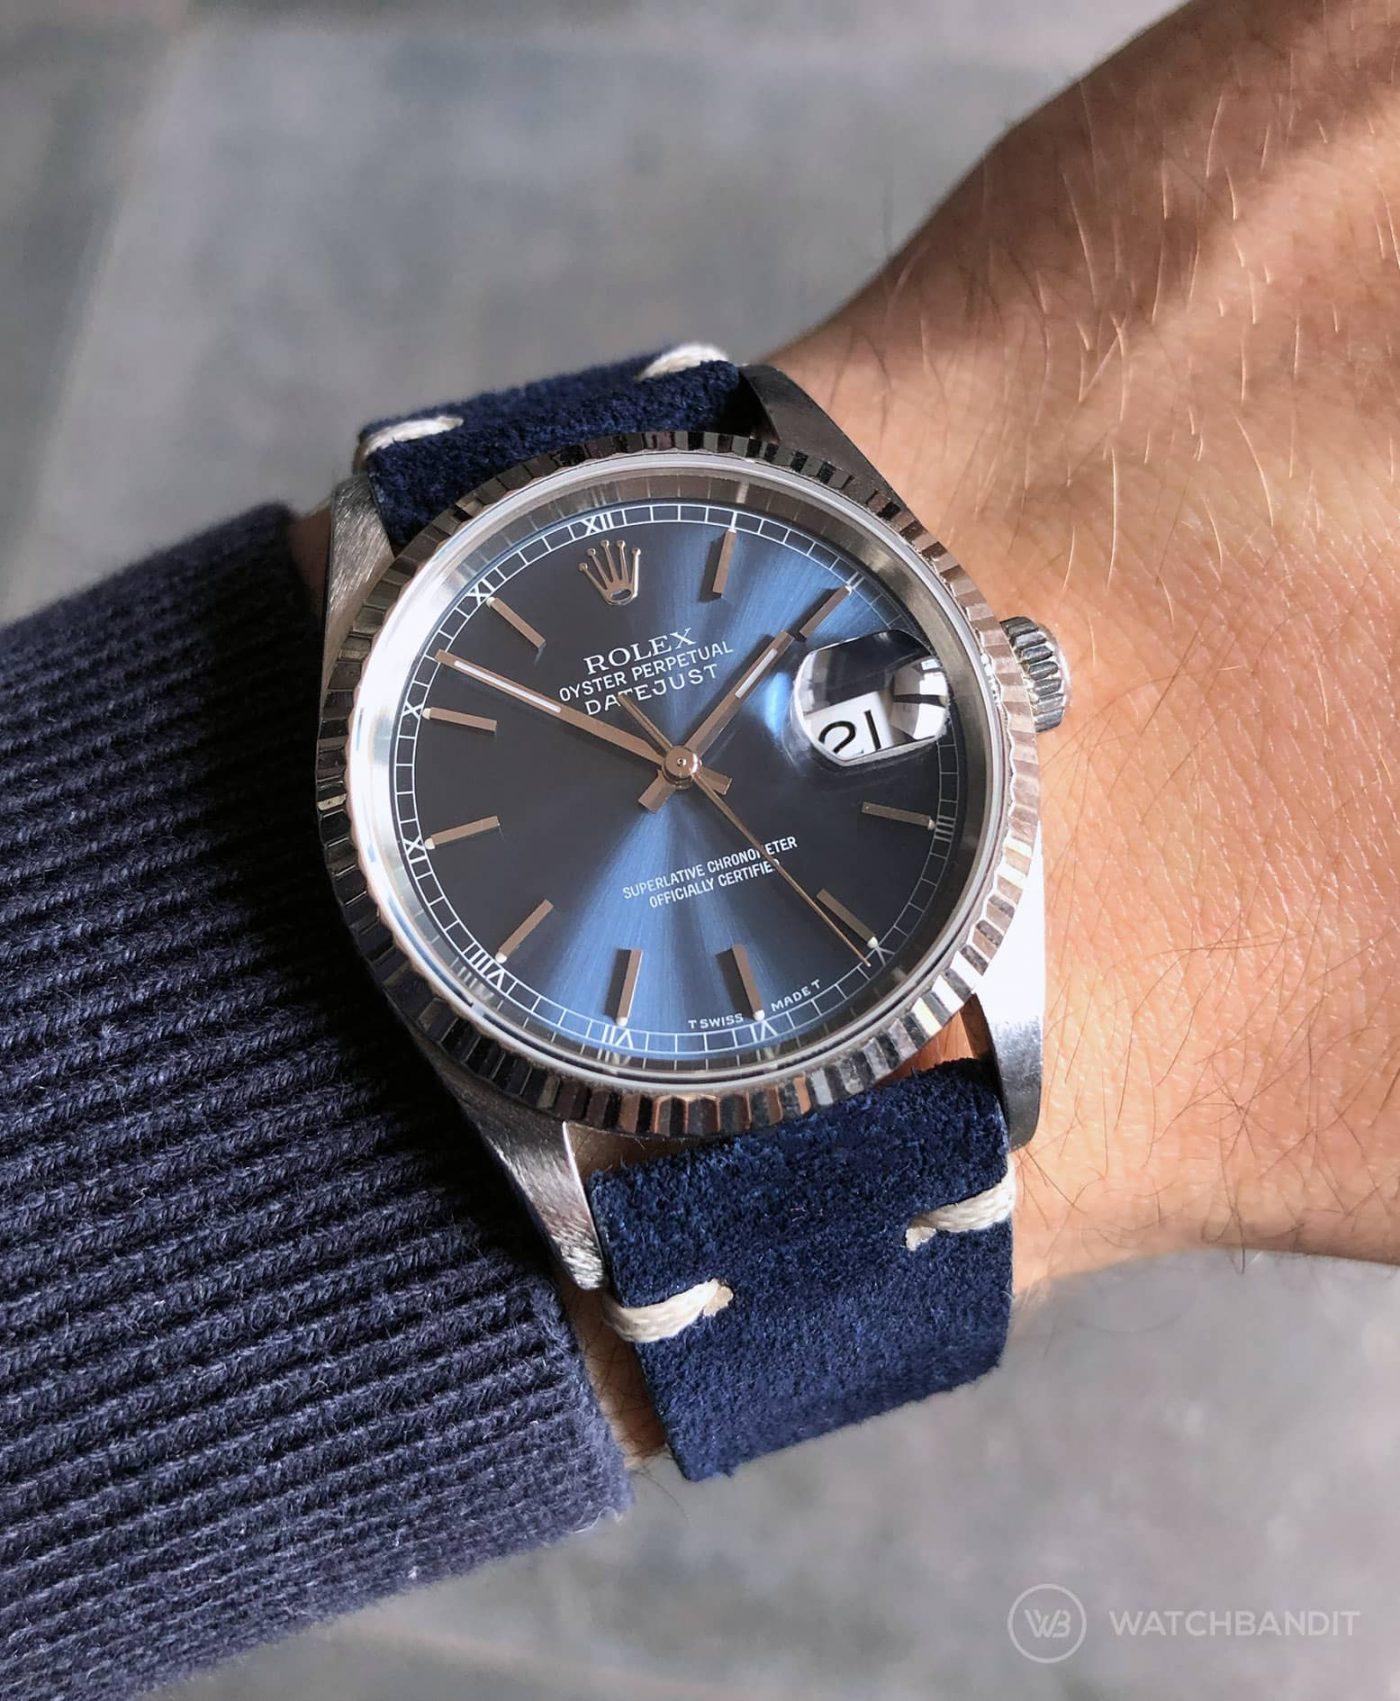 Rolex Datejust 36 Suede strap by WB Original in navy blue